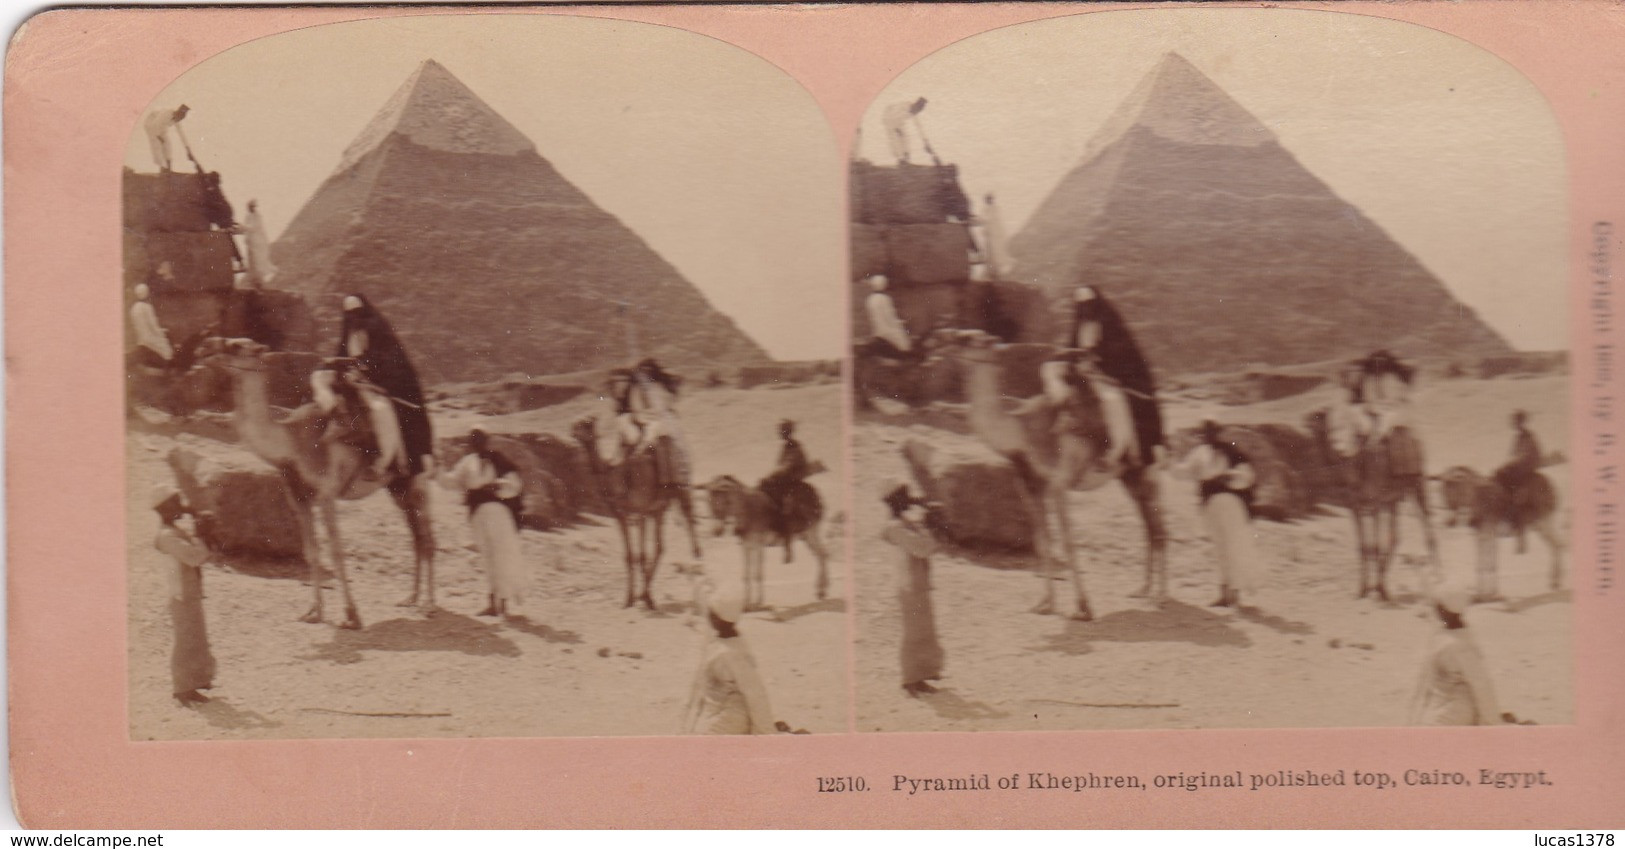 STEREO PHOTO  KILBURN YEAR 1898 / CAIRO / PYRAMID OF KHEPHREN / ORIGINAL POLISHED TOP - Cairo